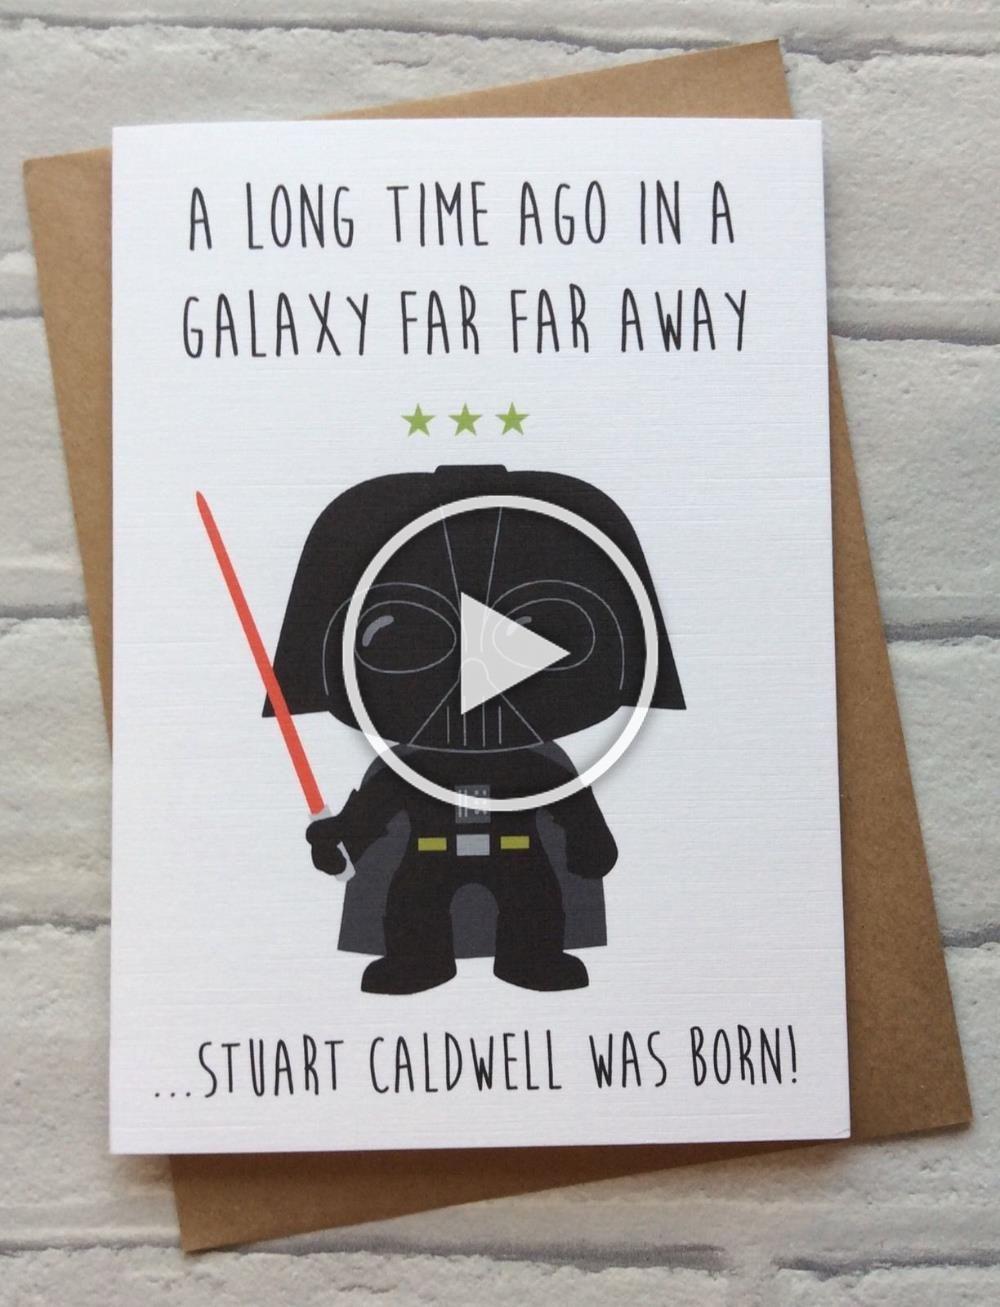 Personalised Handmade Star Wars Birthday Card Darth Vader Quirky Funny Geeky Ebay In 2020 Star Wars Birthday Geeky Humor Birthday Cards